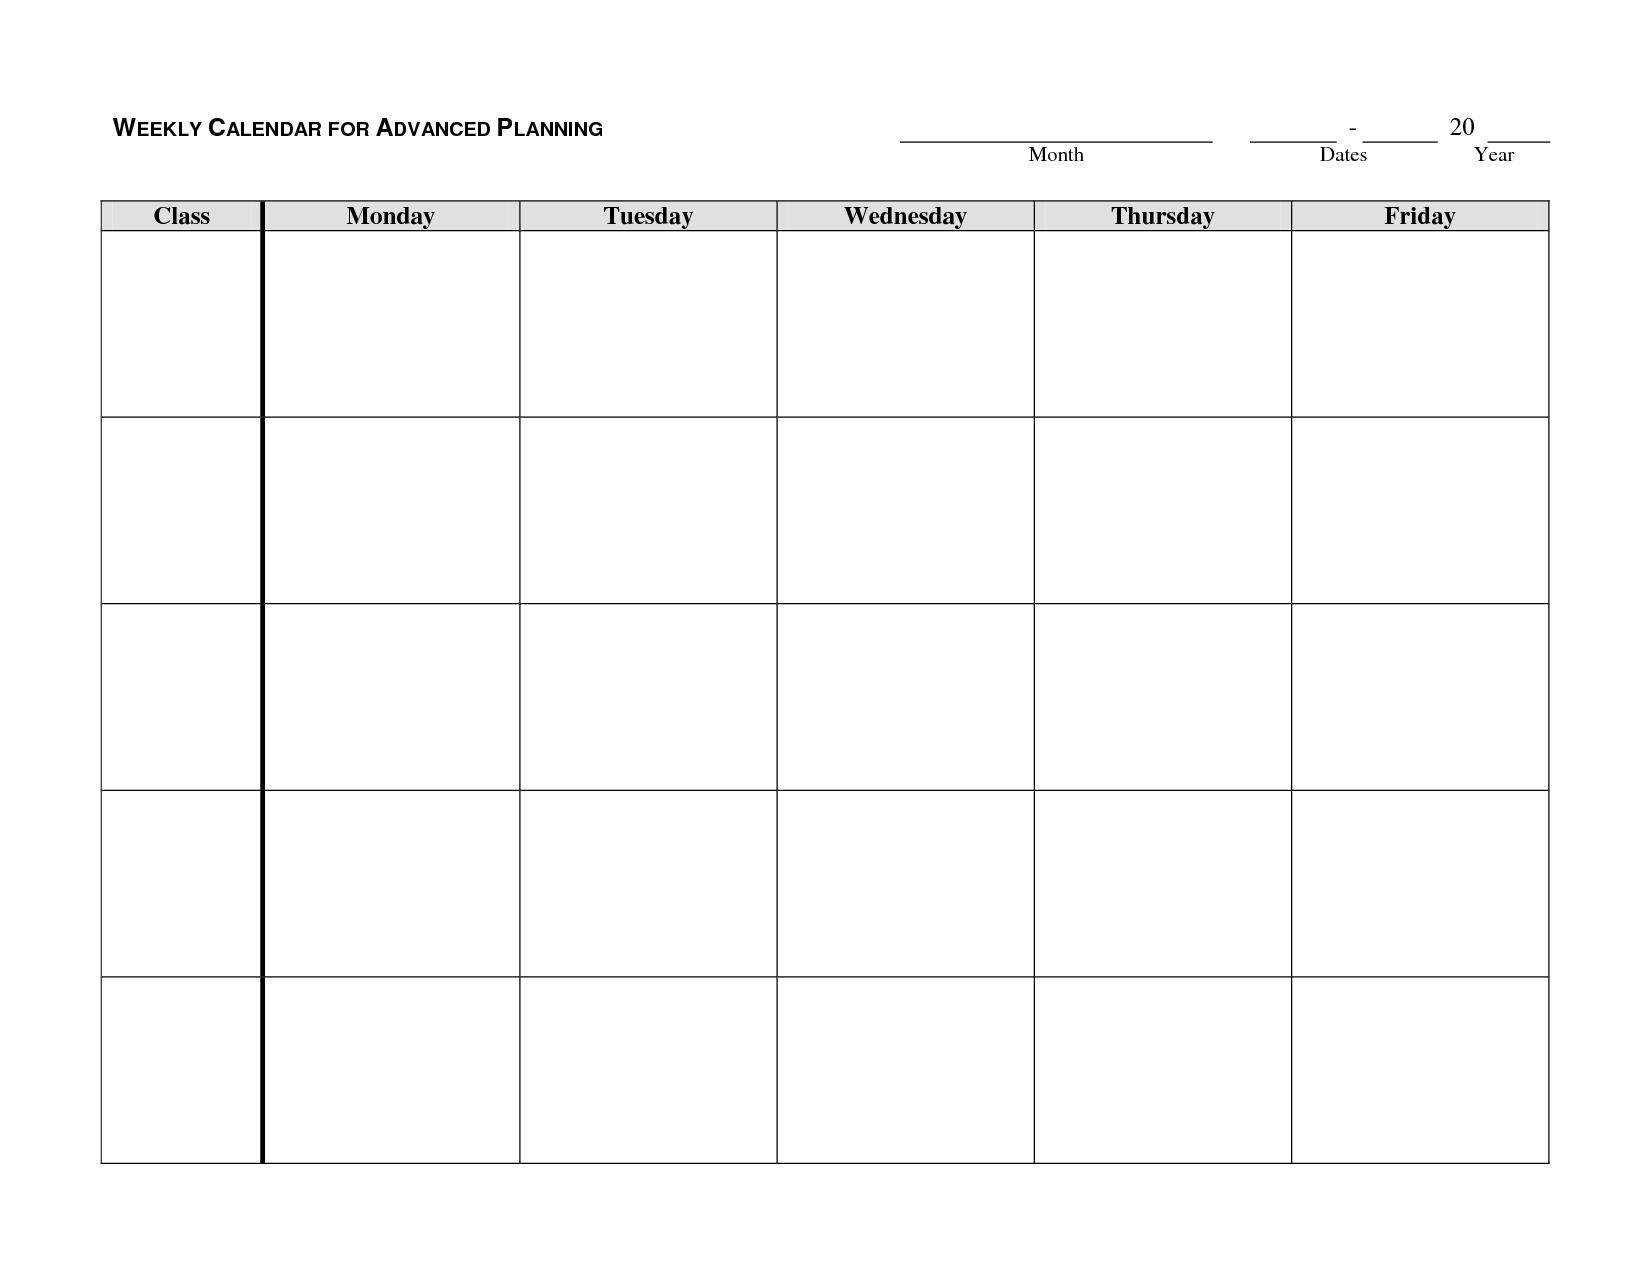 Weekly Calendar Template – Google Search   Blank Calendar 4 Week Calendar Template With Enterable Date